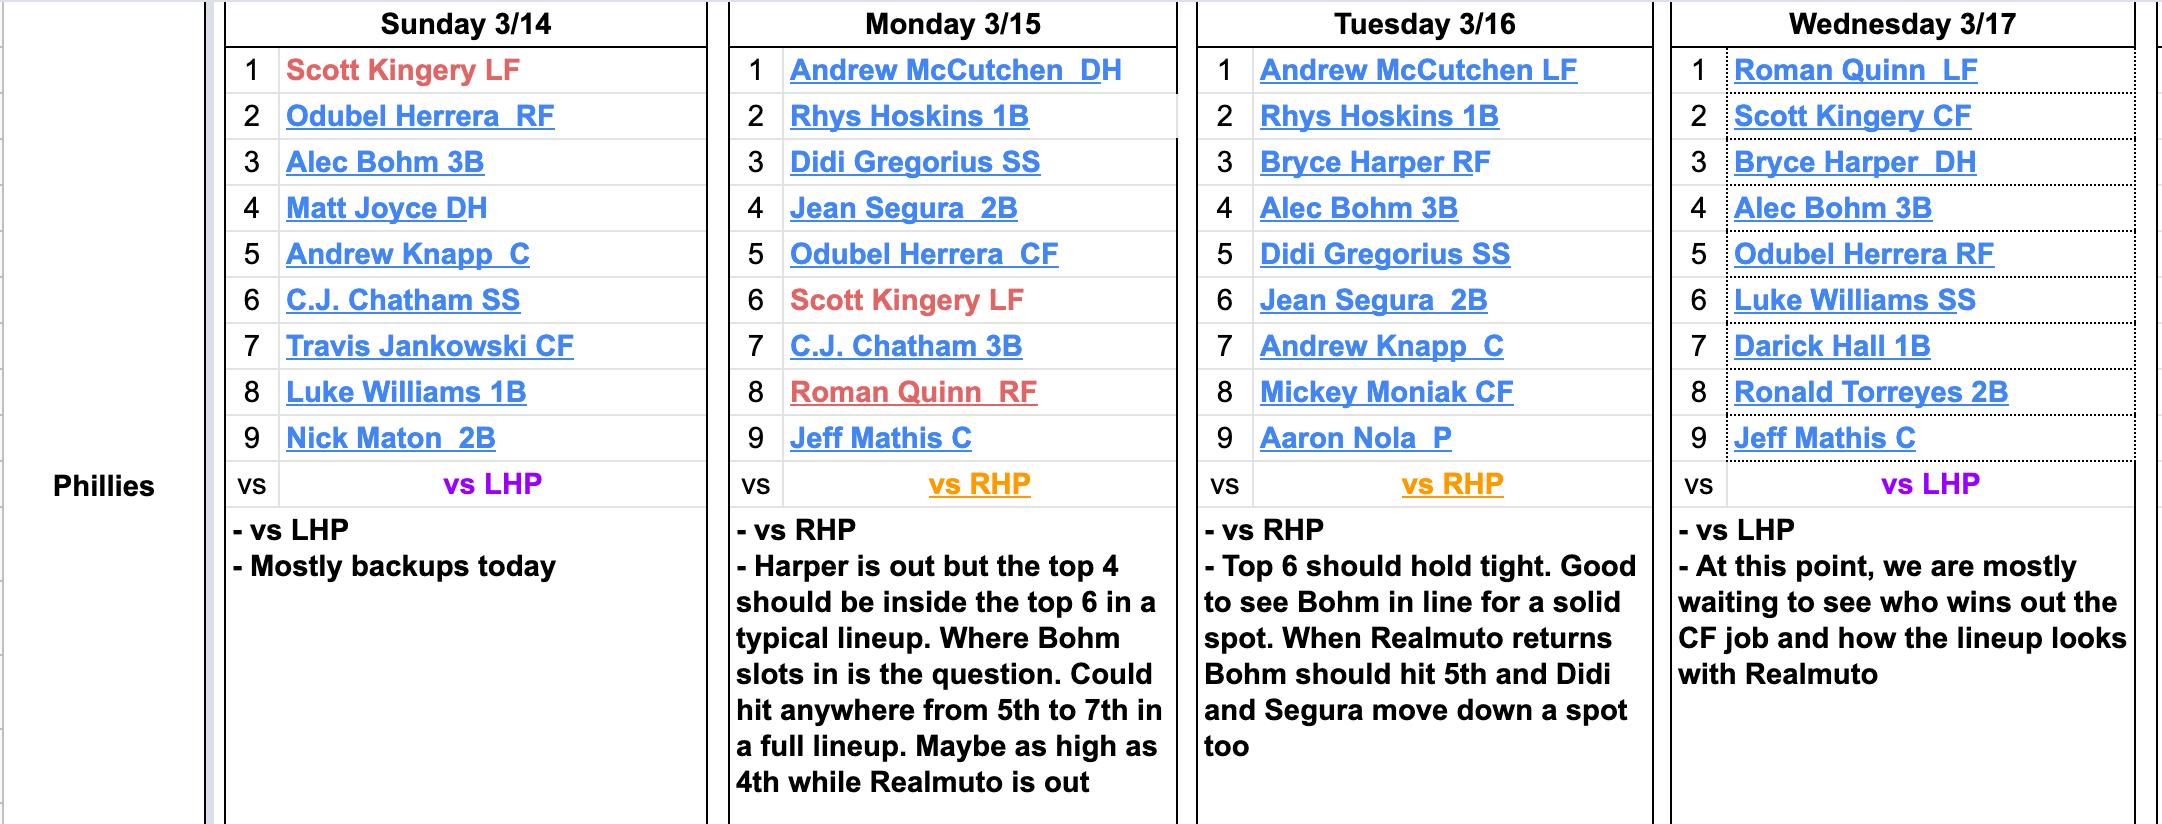 Lineup Takeaways